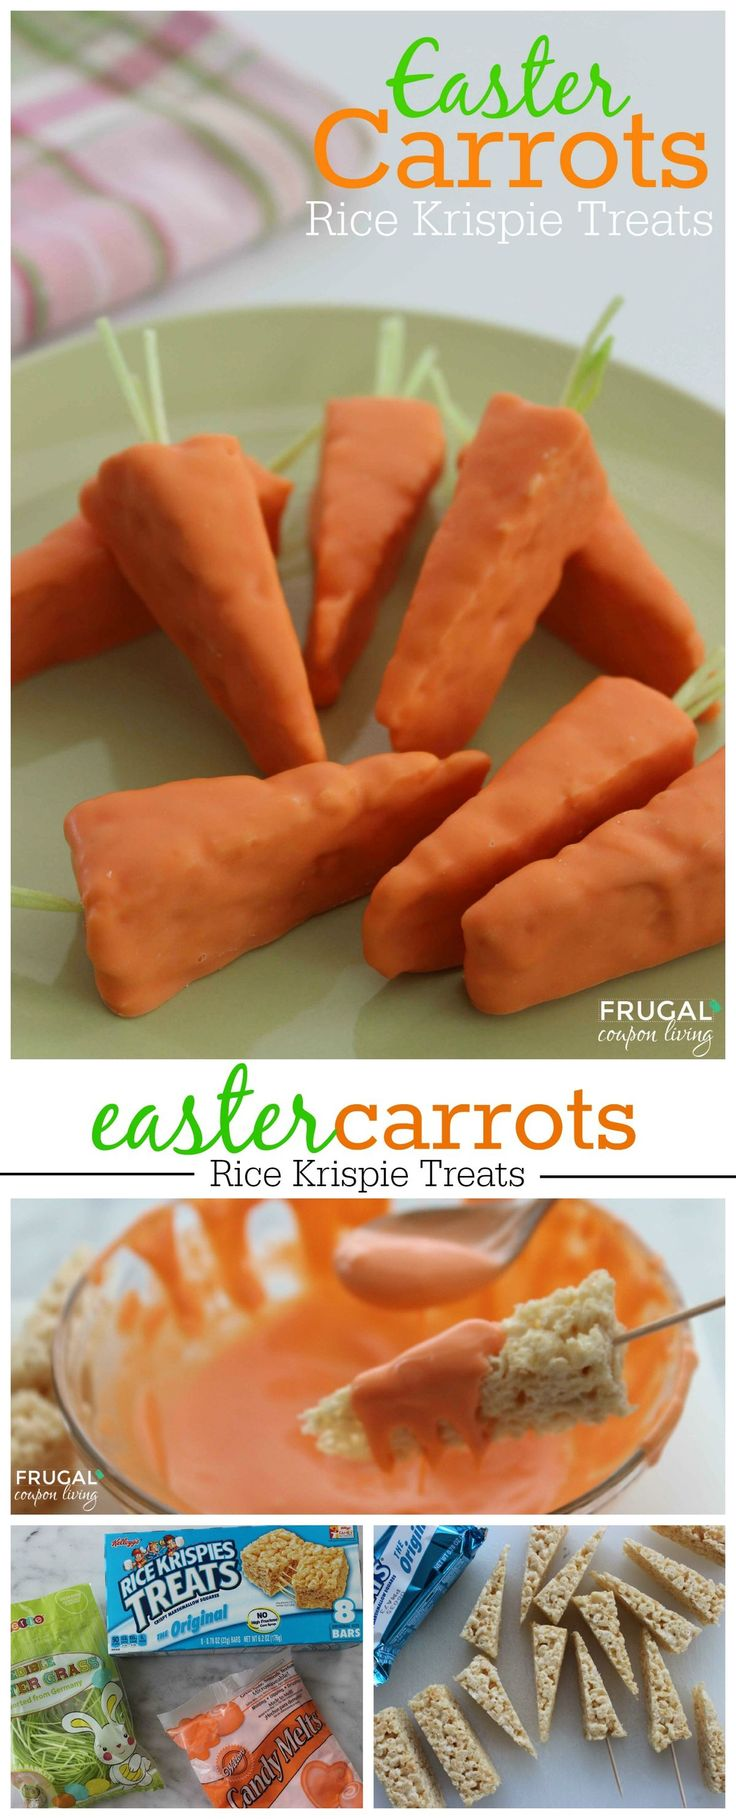 Easy Easter Carrot Rice Krispies Treats - 3 Ingredients. Kids Food Craft on Frugal Coupon LIving. Easter Snack. Easter Recipe. Kids Food Idea.